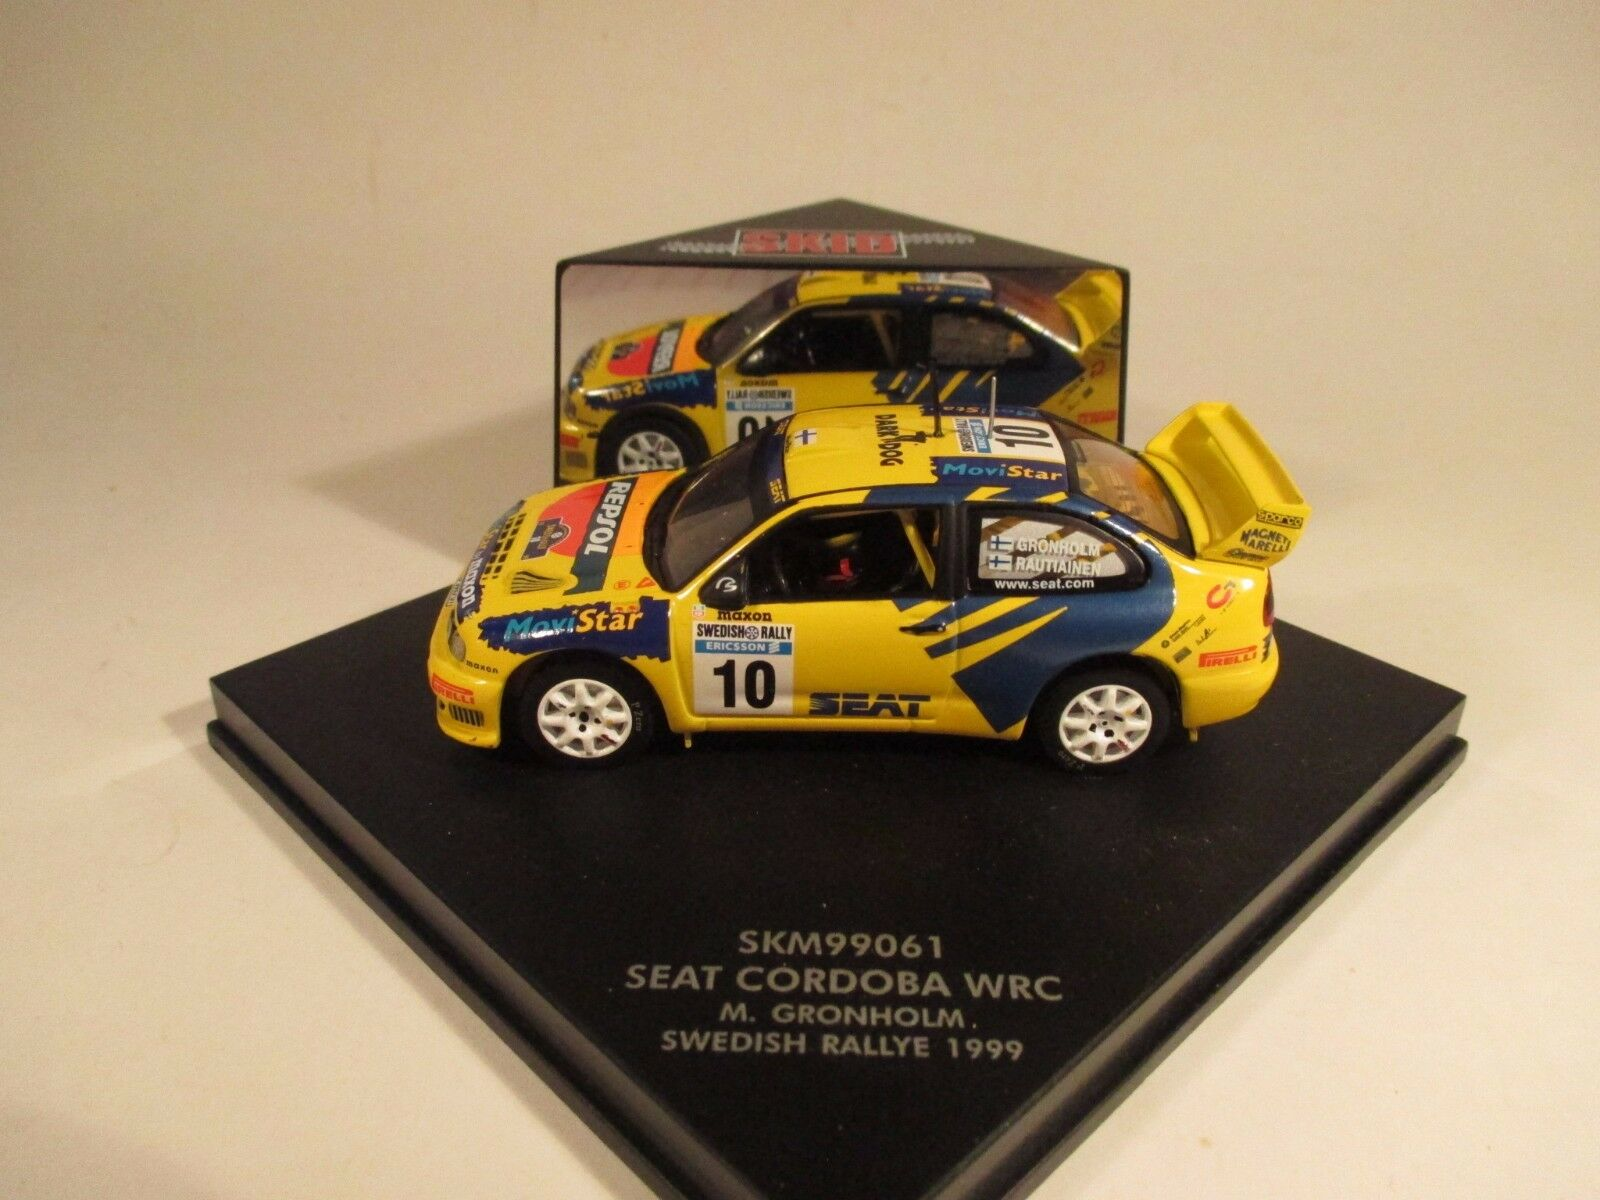 Skid SKM99061 SEAT CORDOBA WRC sueco 1999 1 43 Menta en caja